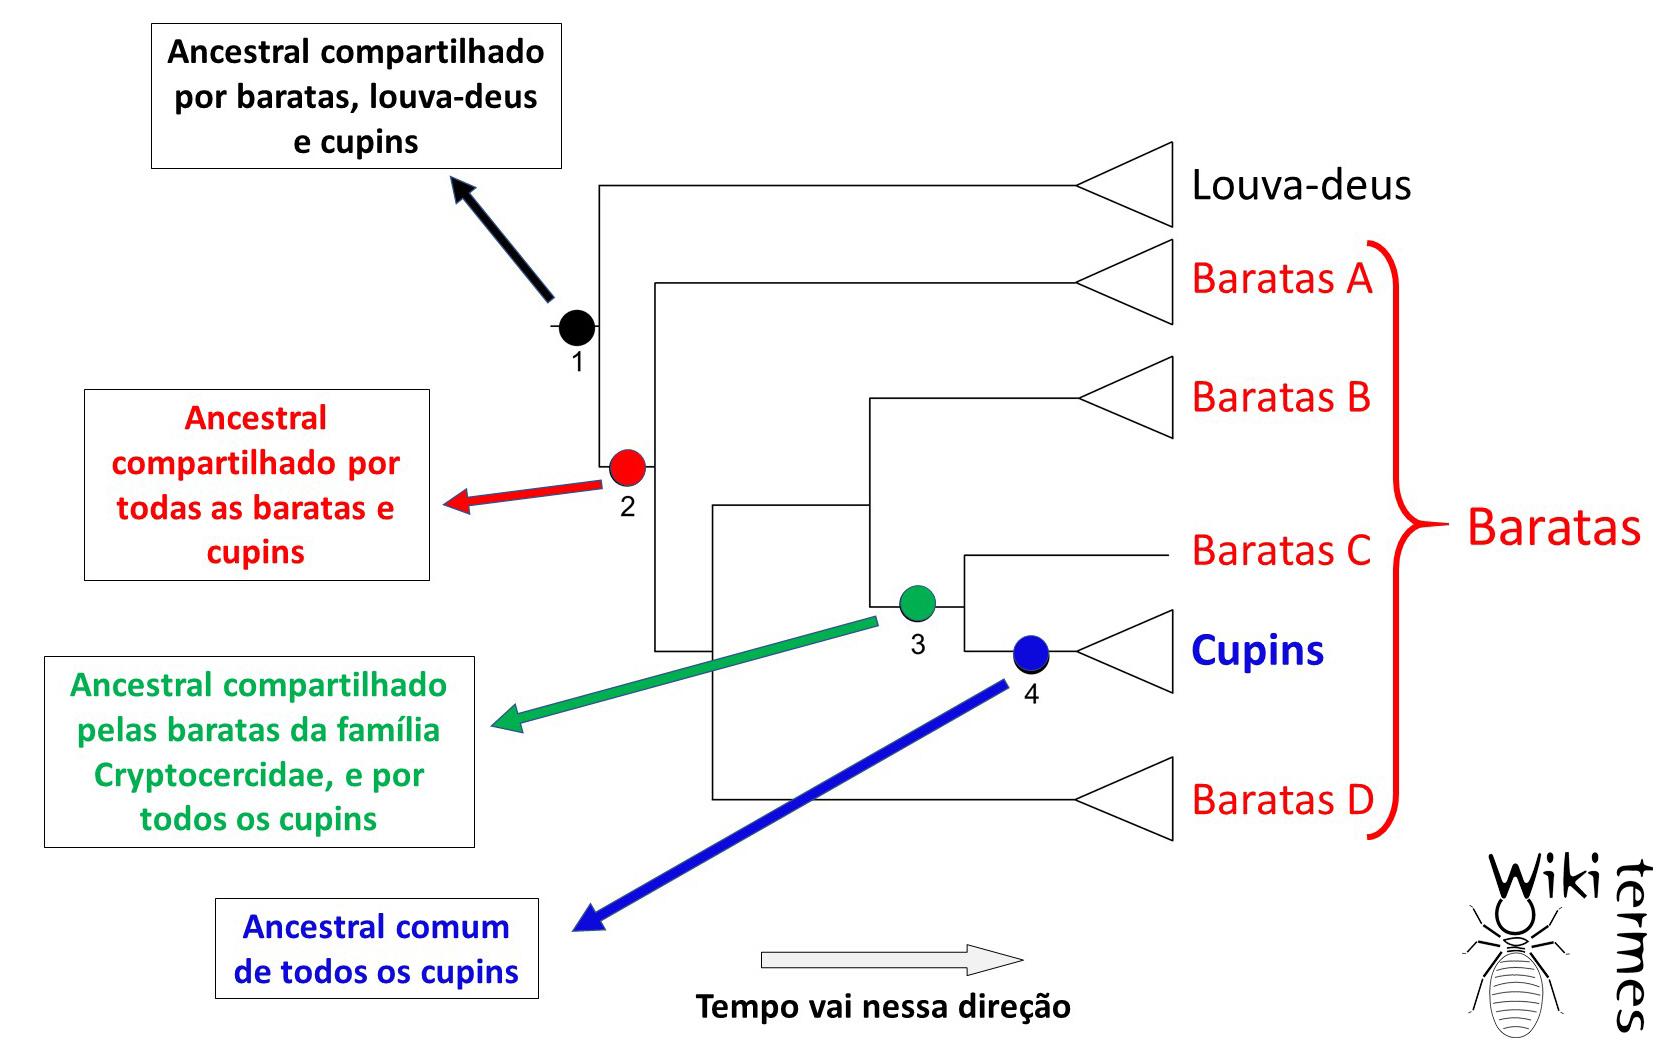 Filogenia.jpg